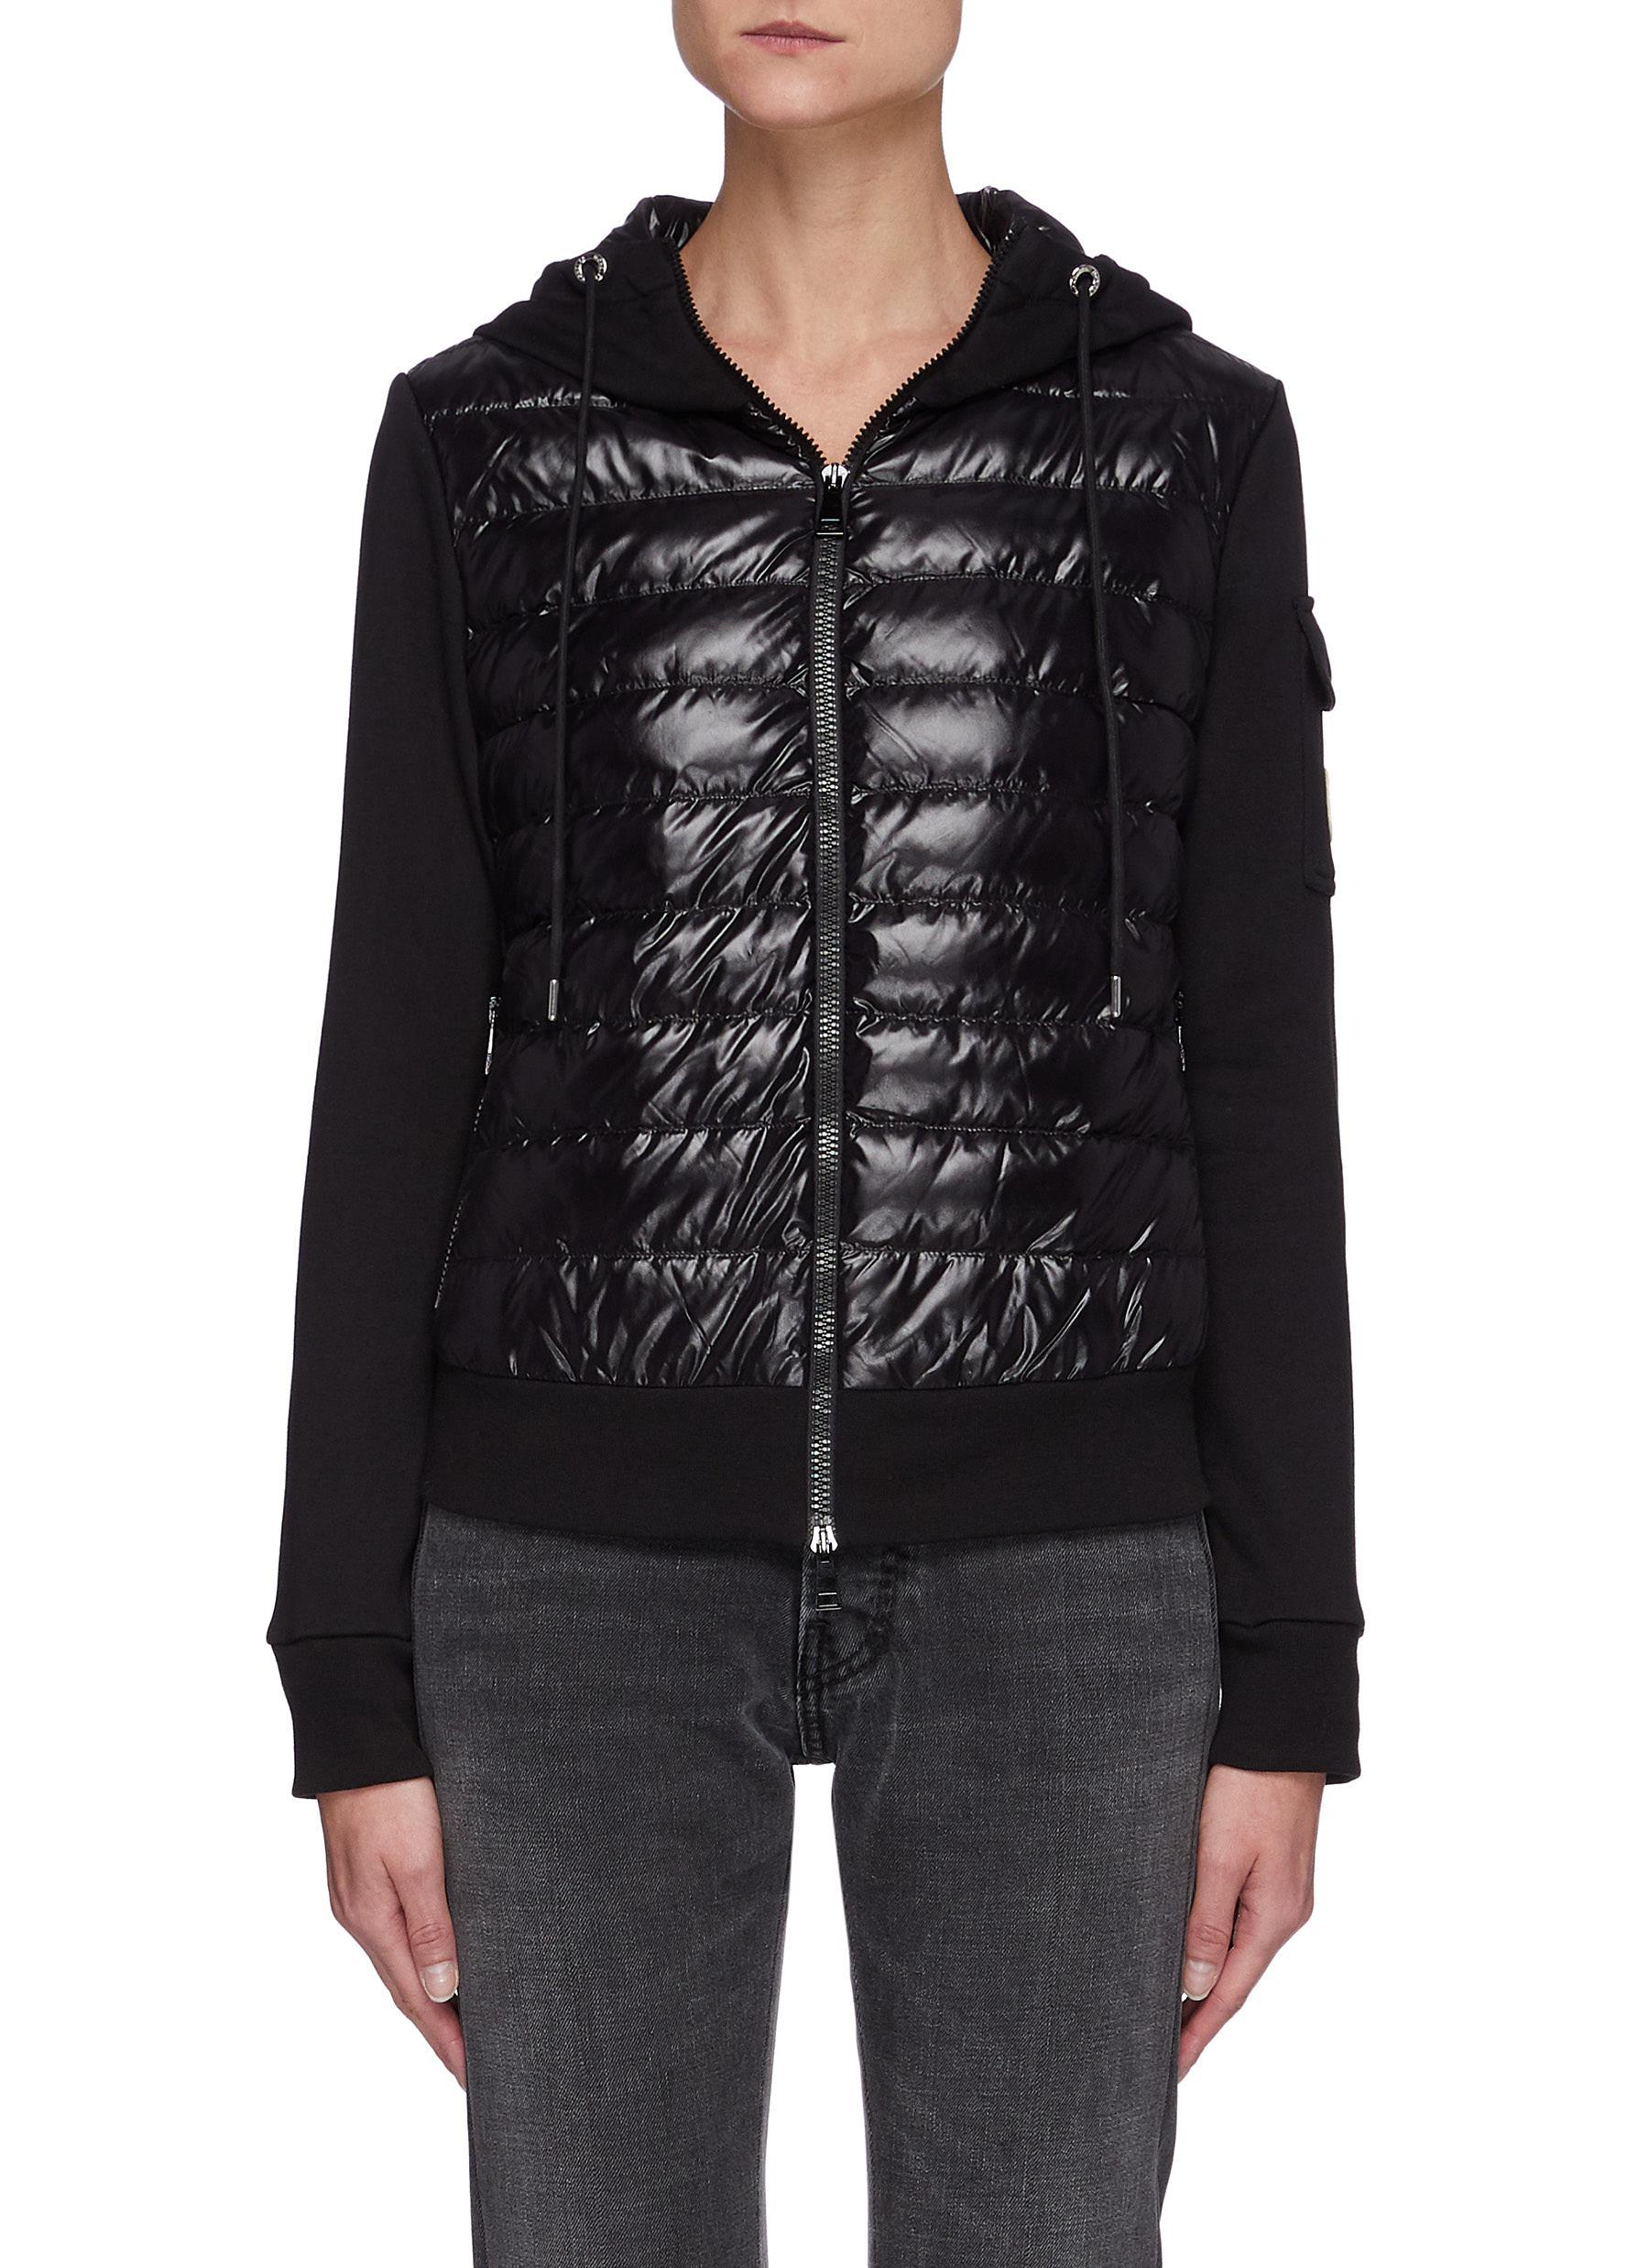 Puffer Body Hooded Zip Up Jacket